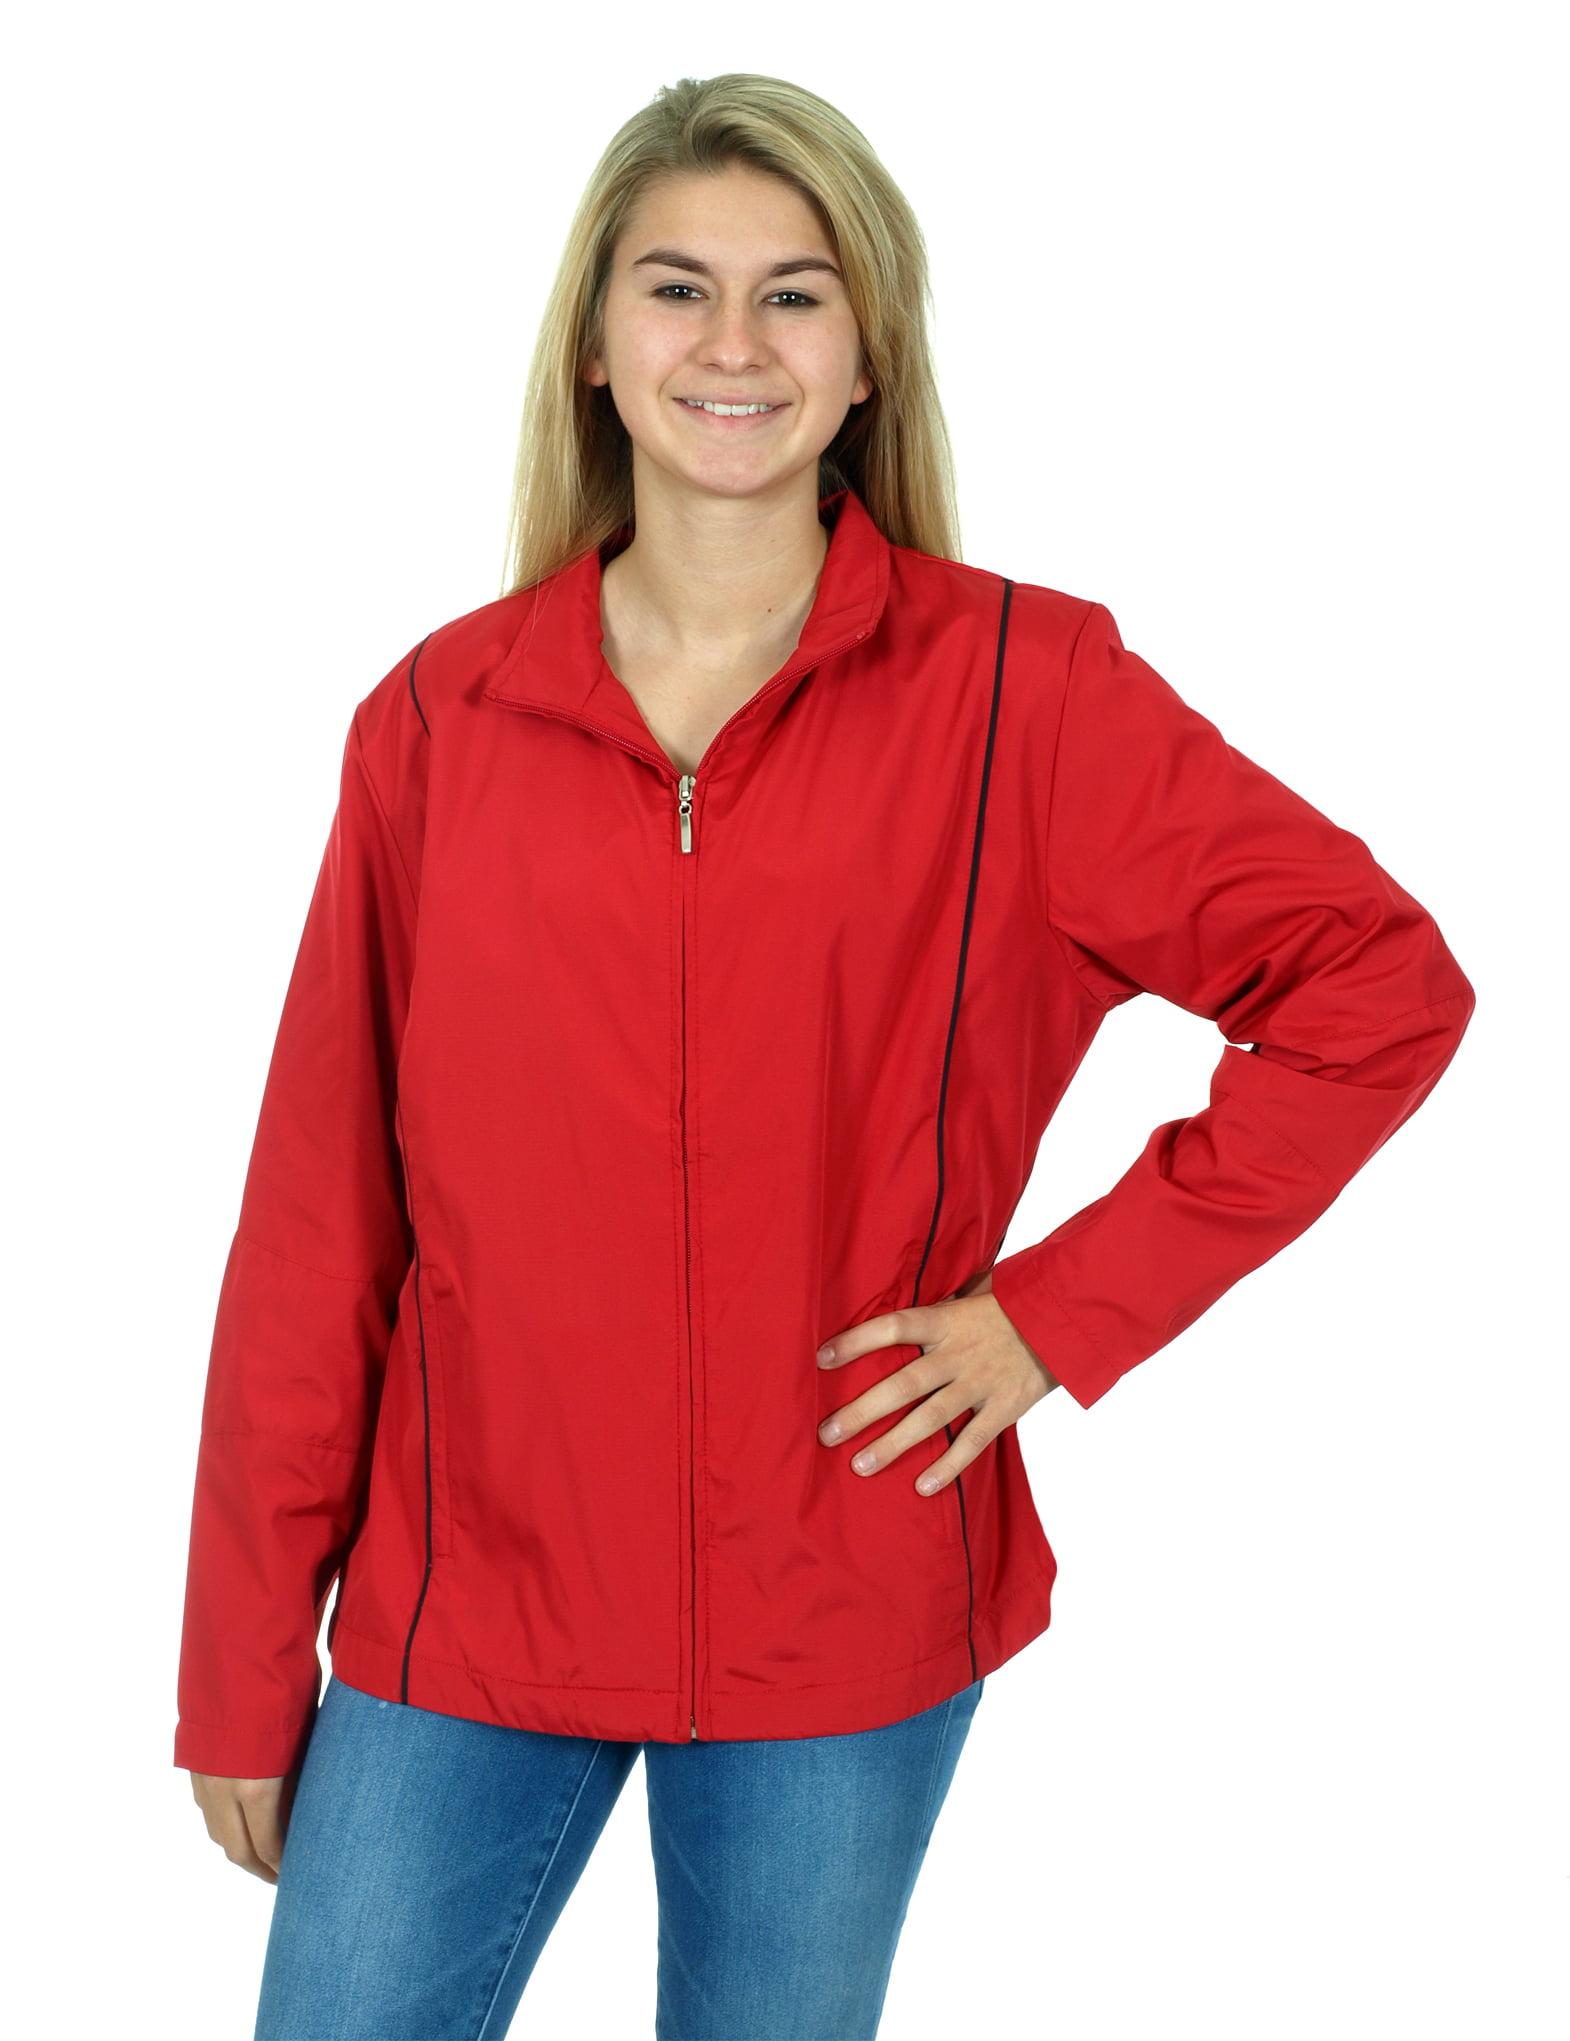 Tri-Mountain Women's Lightweight Zip Up Hiking Jacket